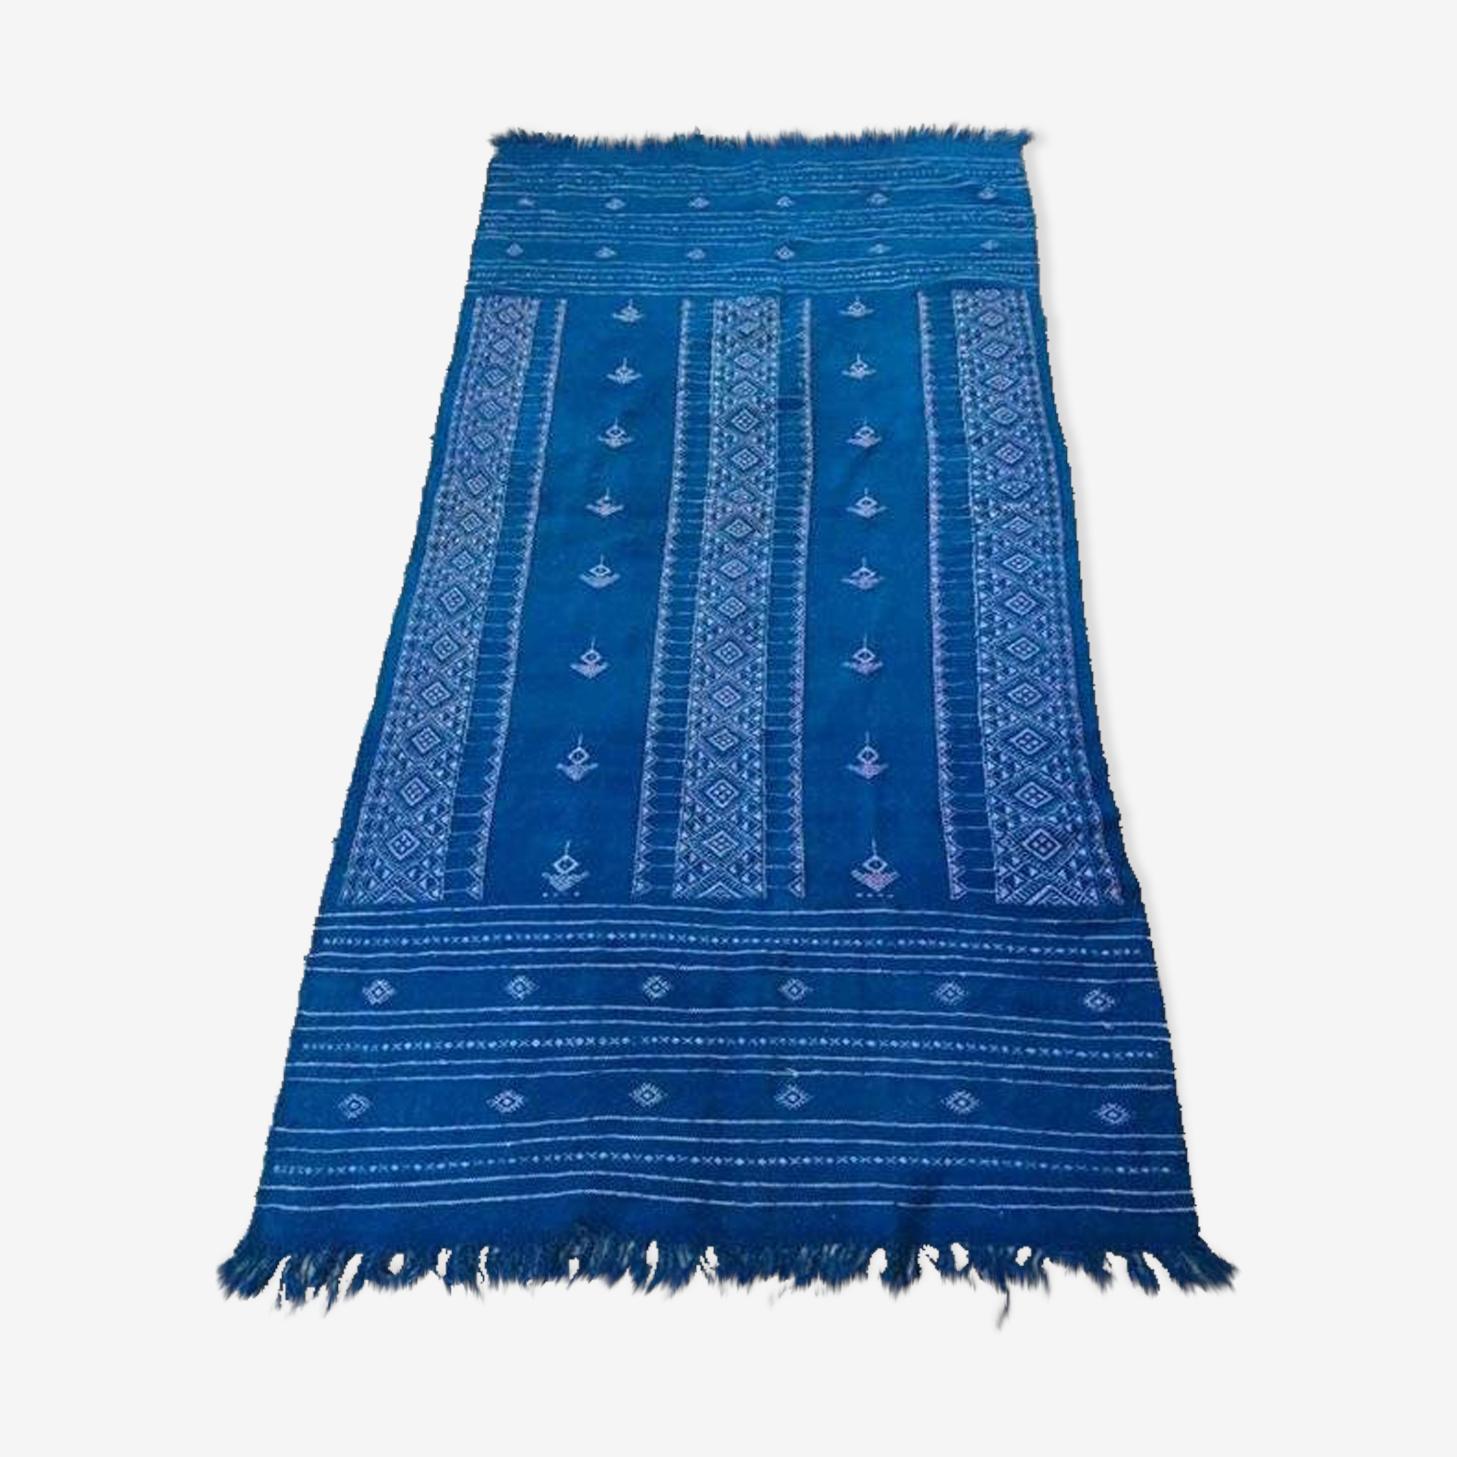 Carpet kilim Berber 200x100cm